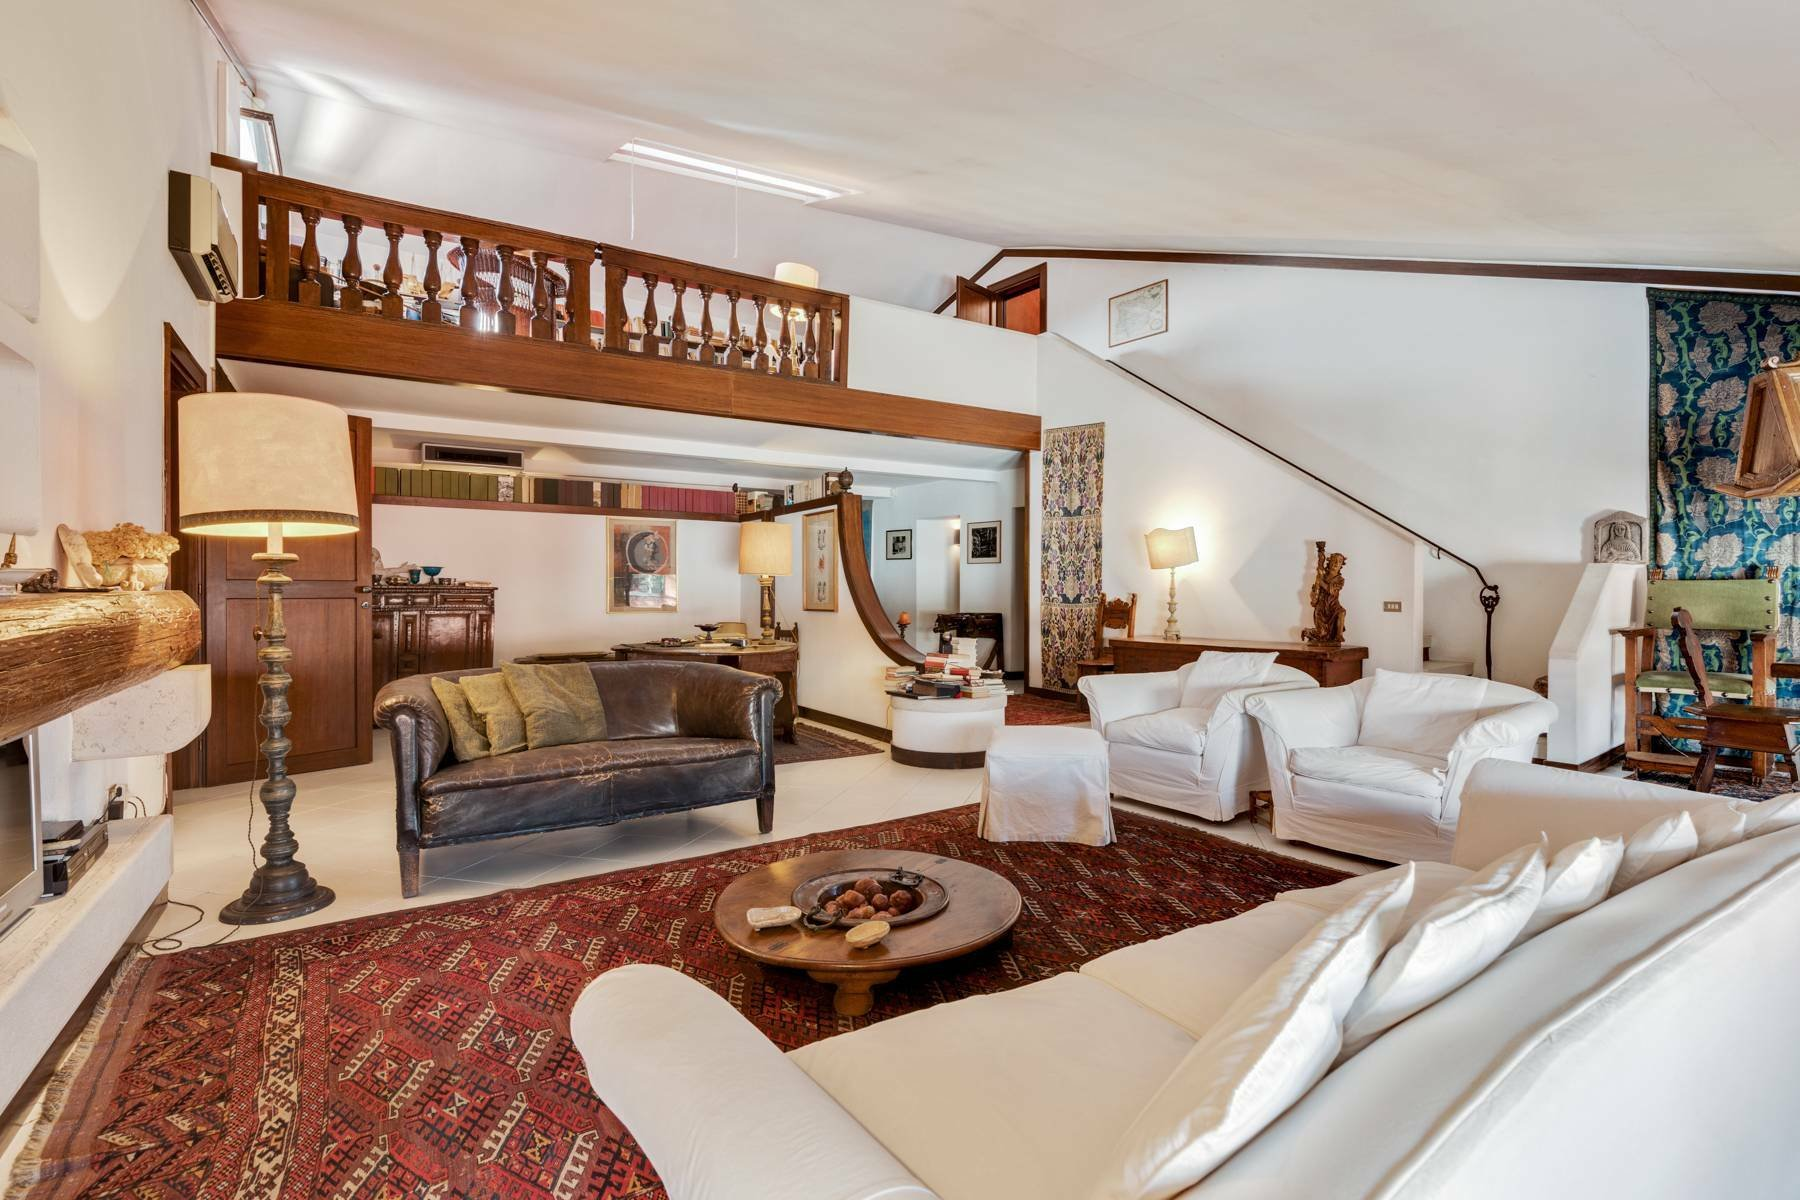 Apartment in Verona, Veneto, Italy 1